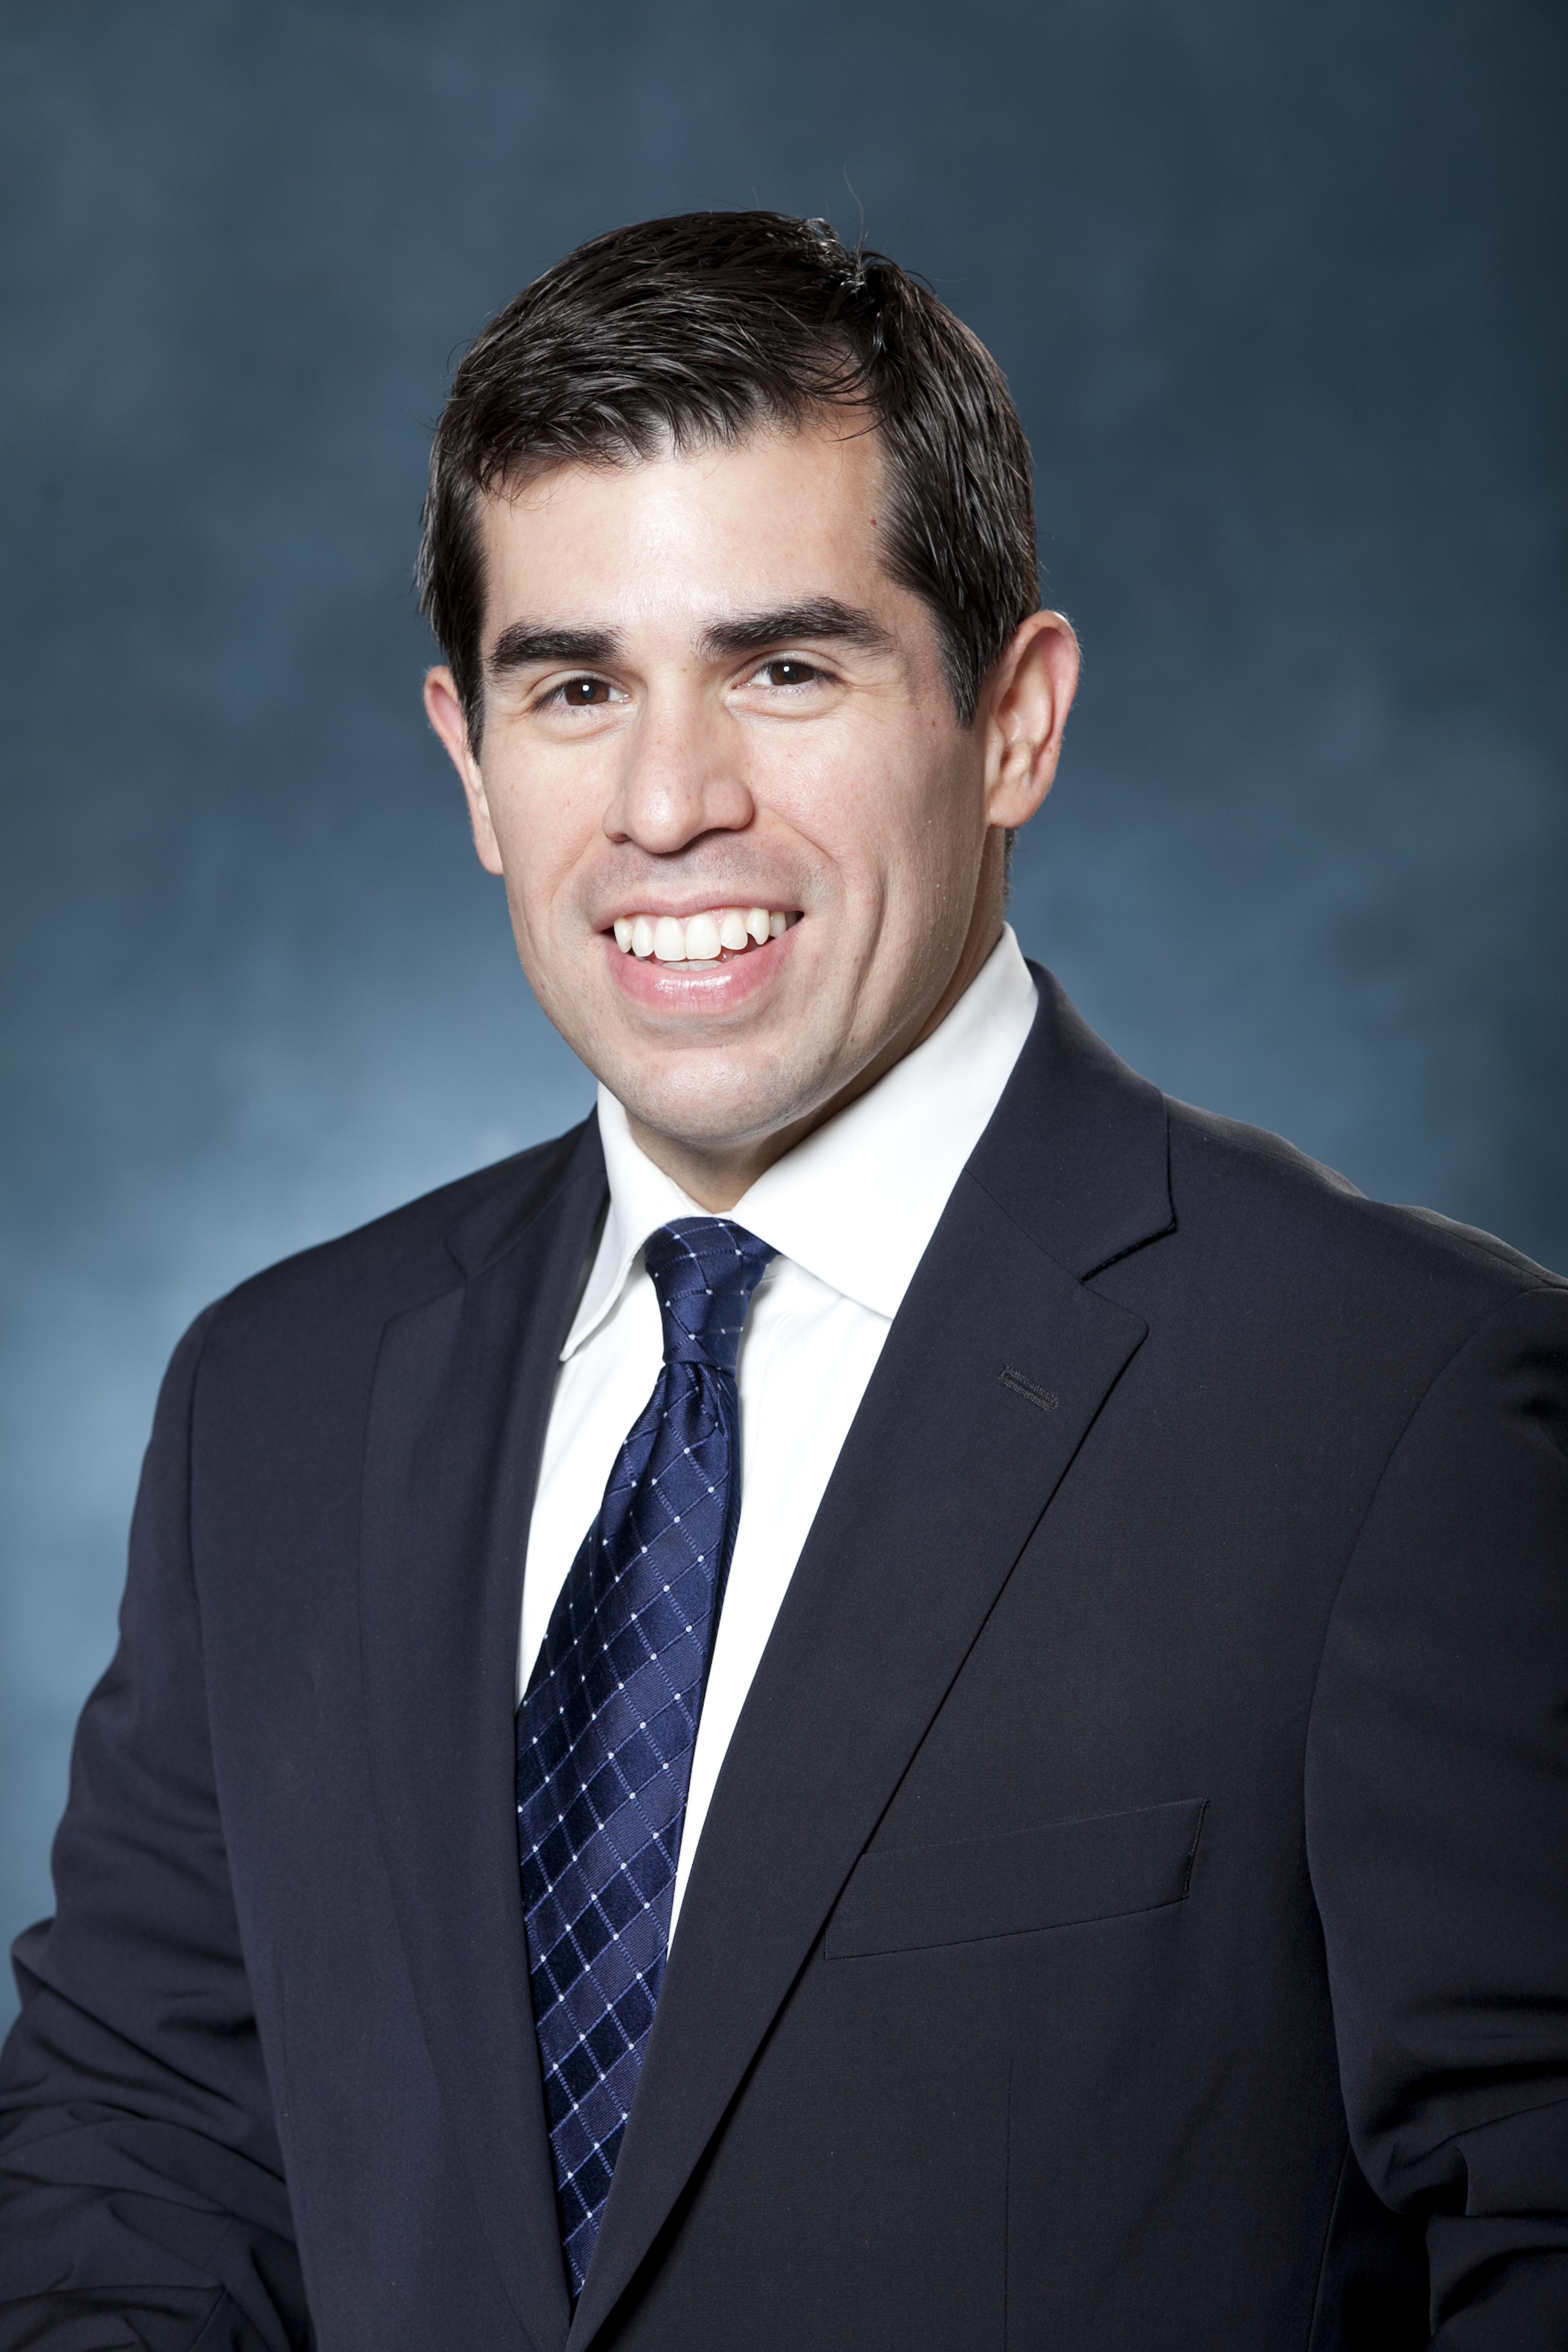 Enrique B. Pena, MD